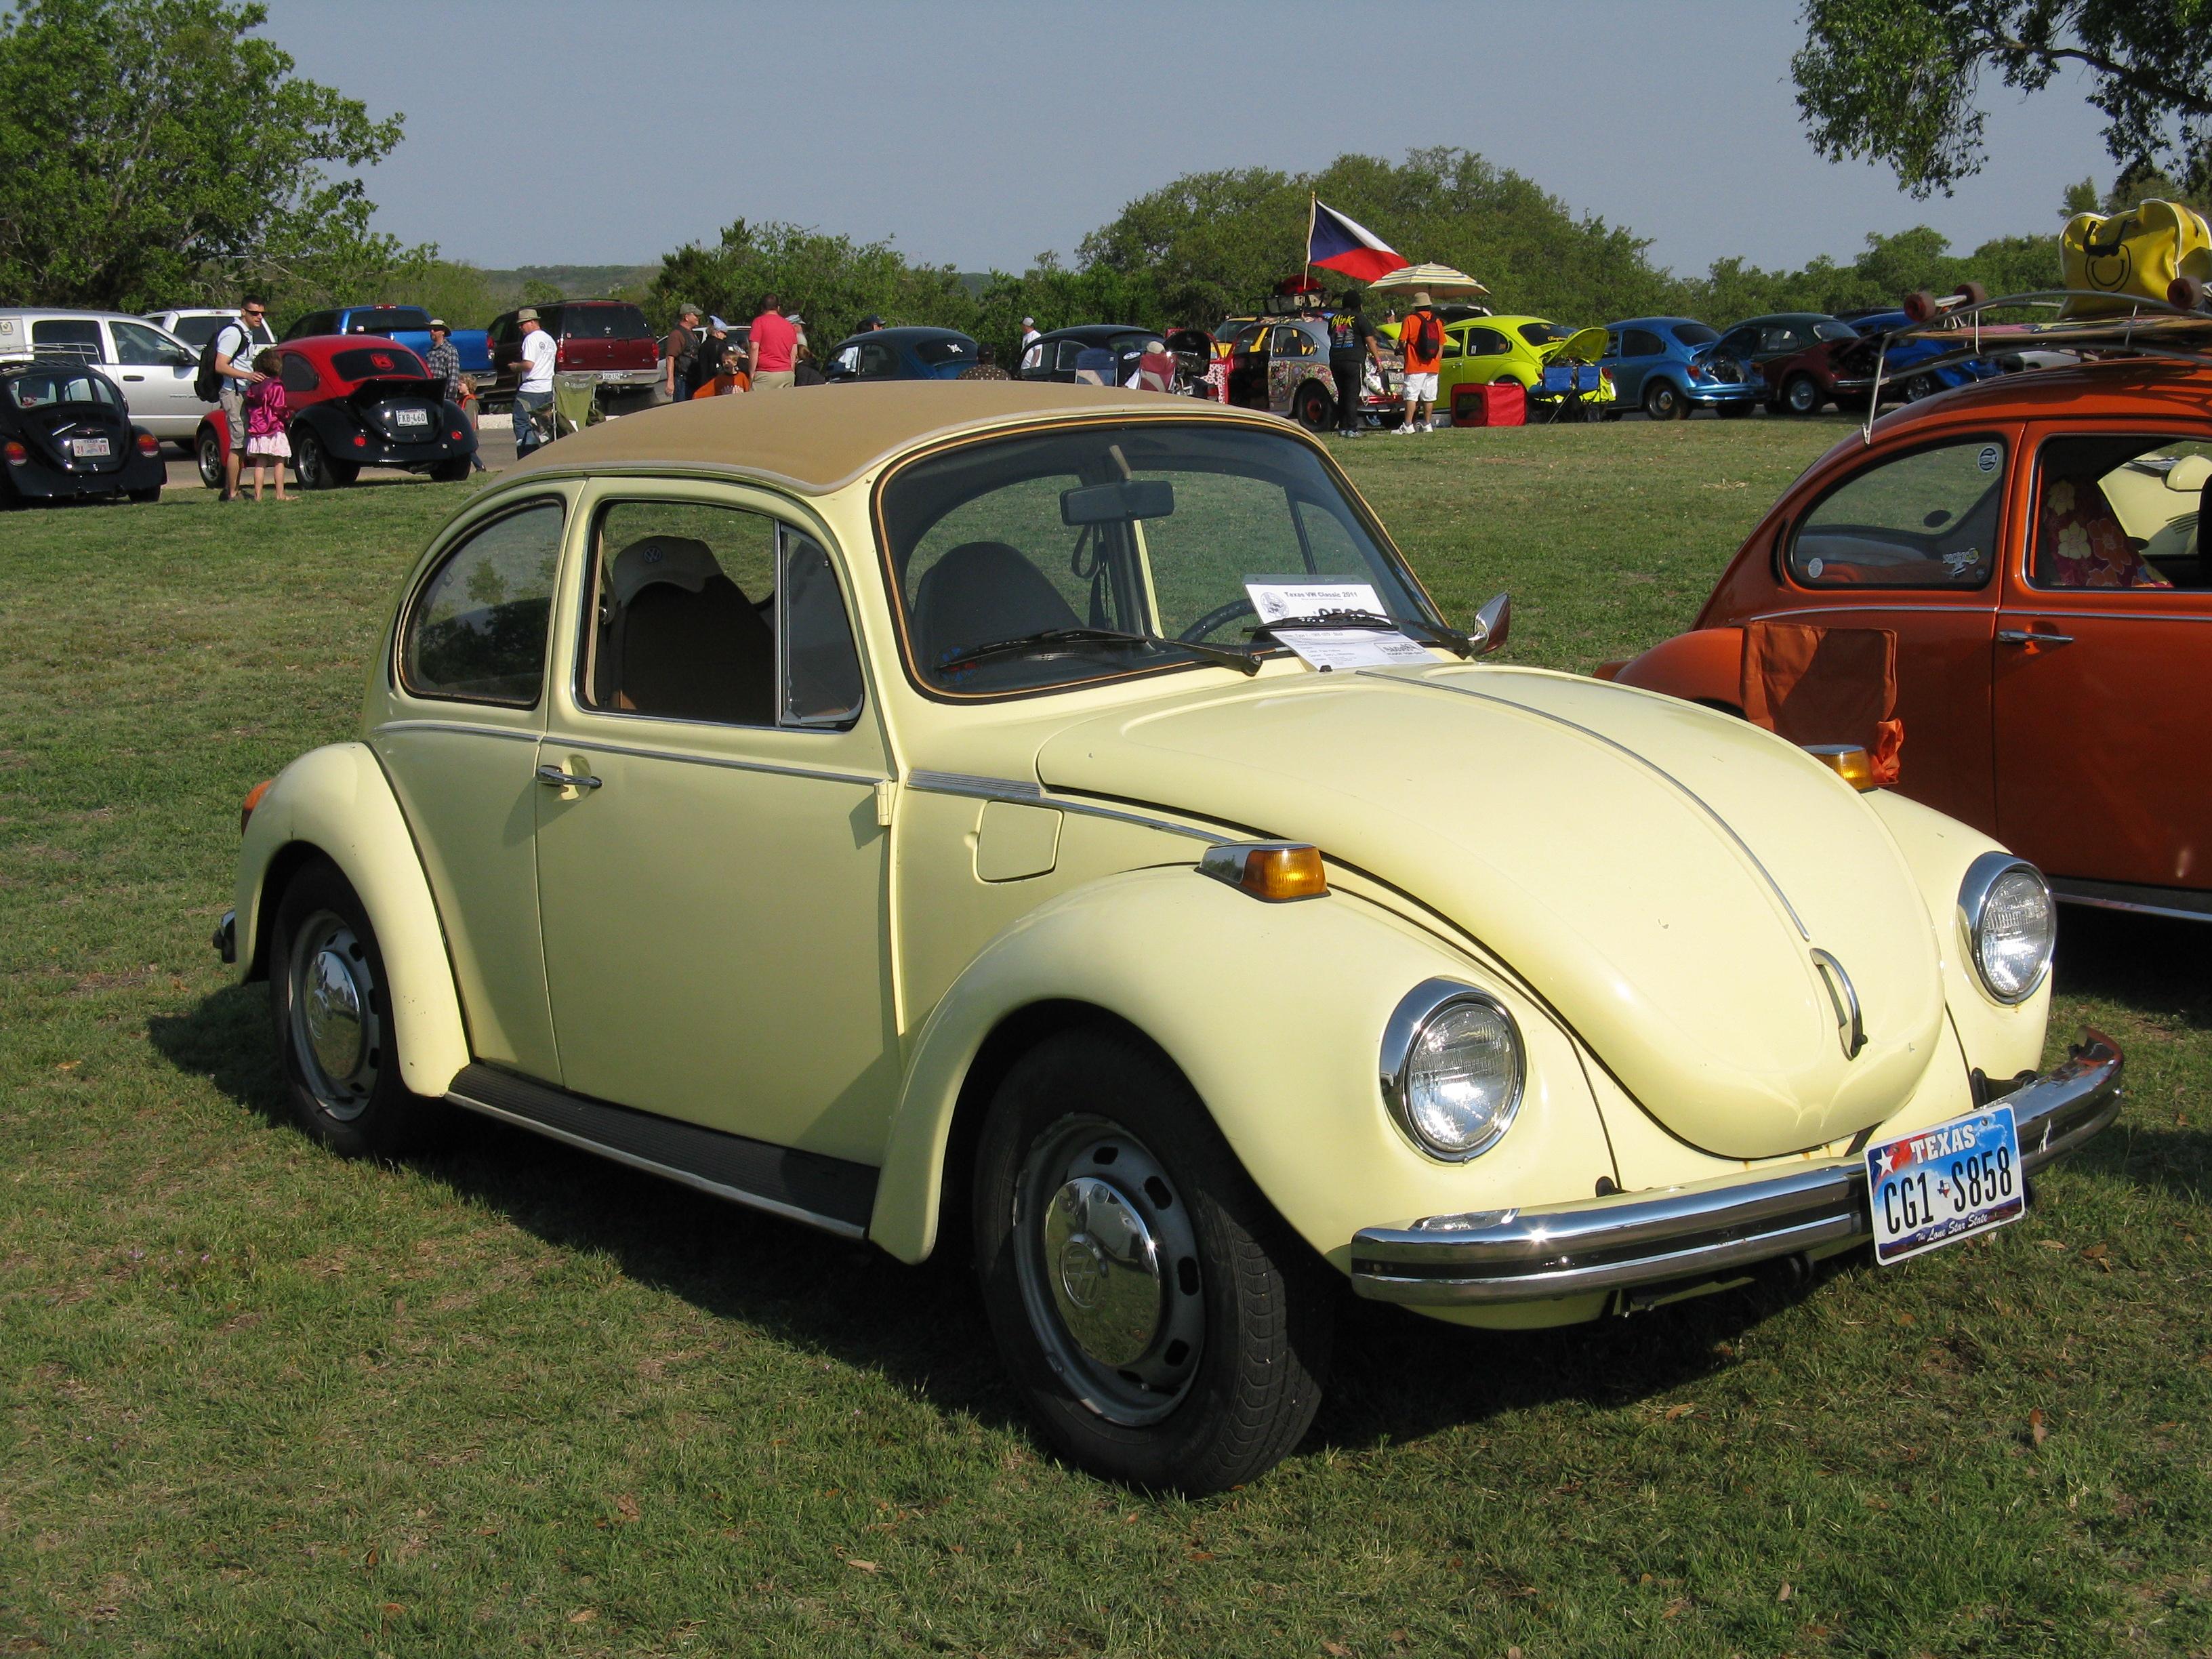 Gizmo (#0502) - Texas VW Classic